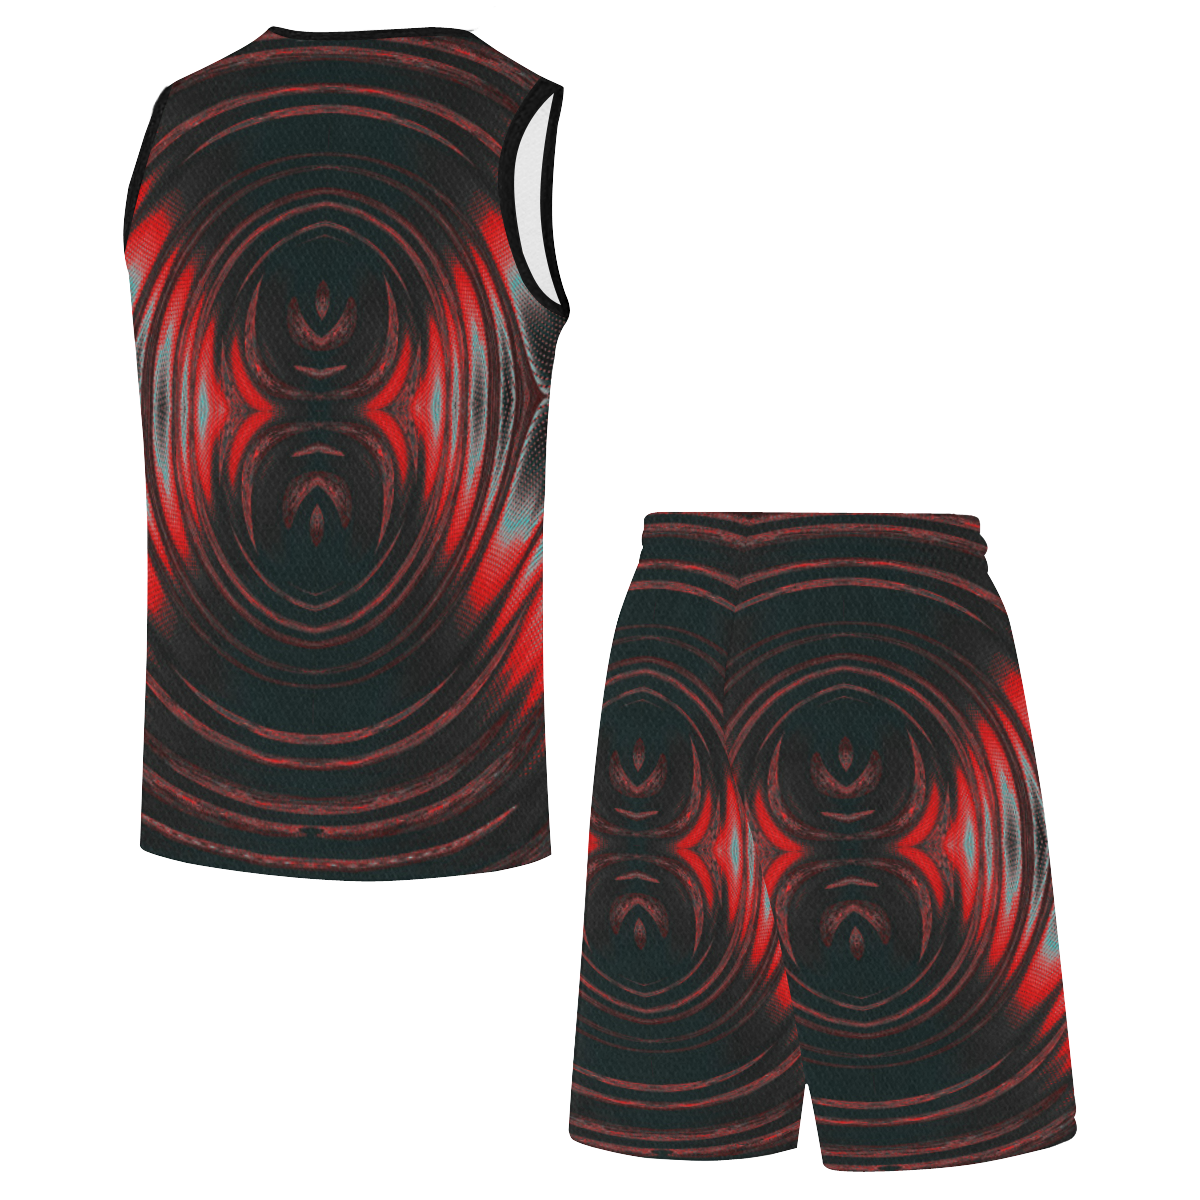 5000TRYtwo2 106 dEEP mONSTER  8 25 A sml All Over Print Basketball Uniform